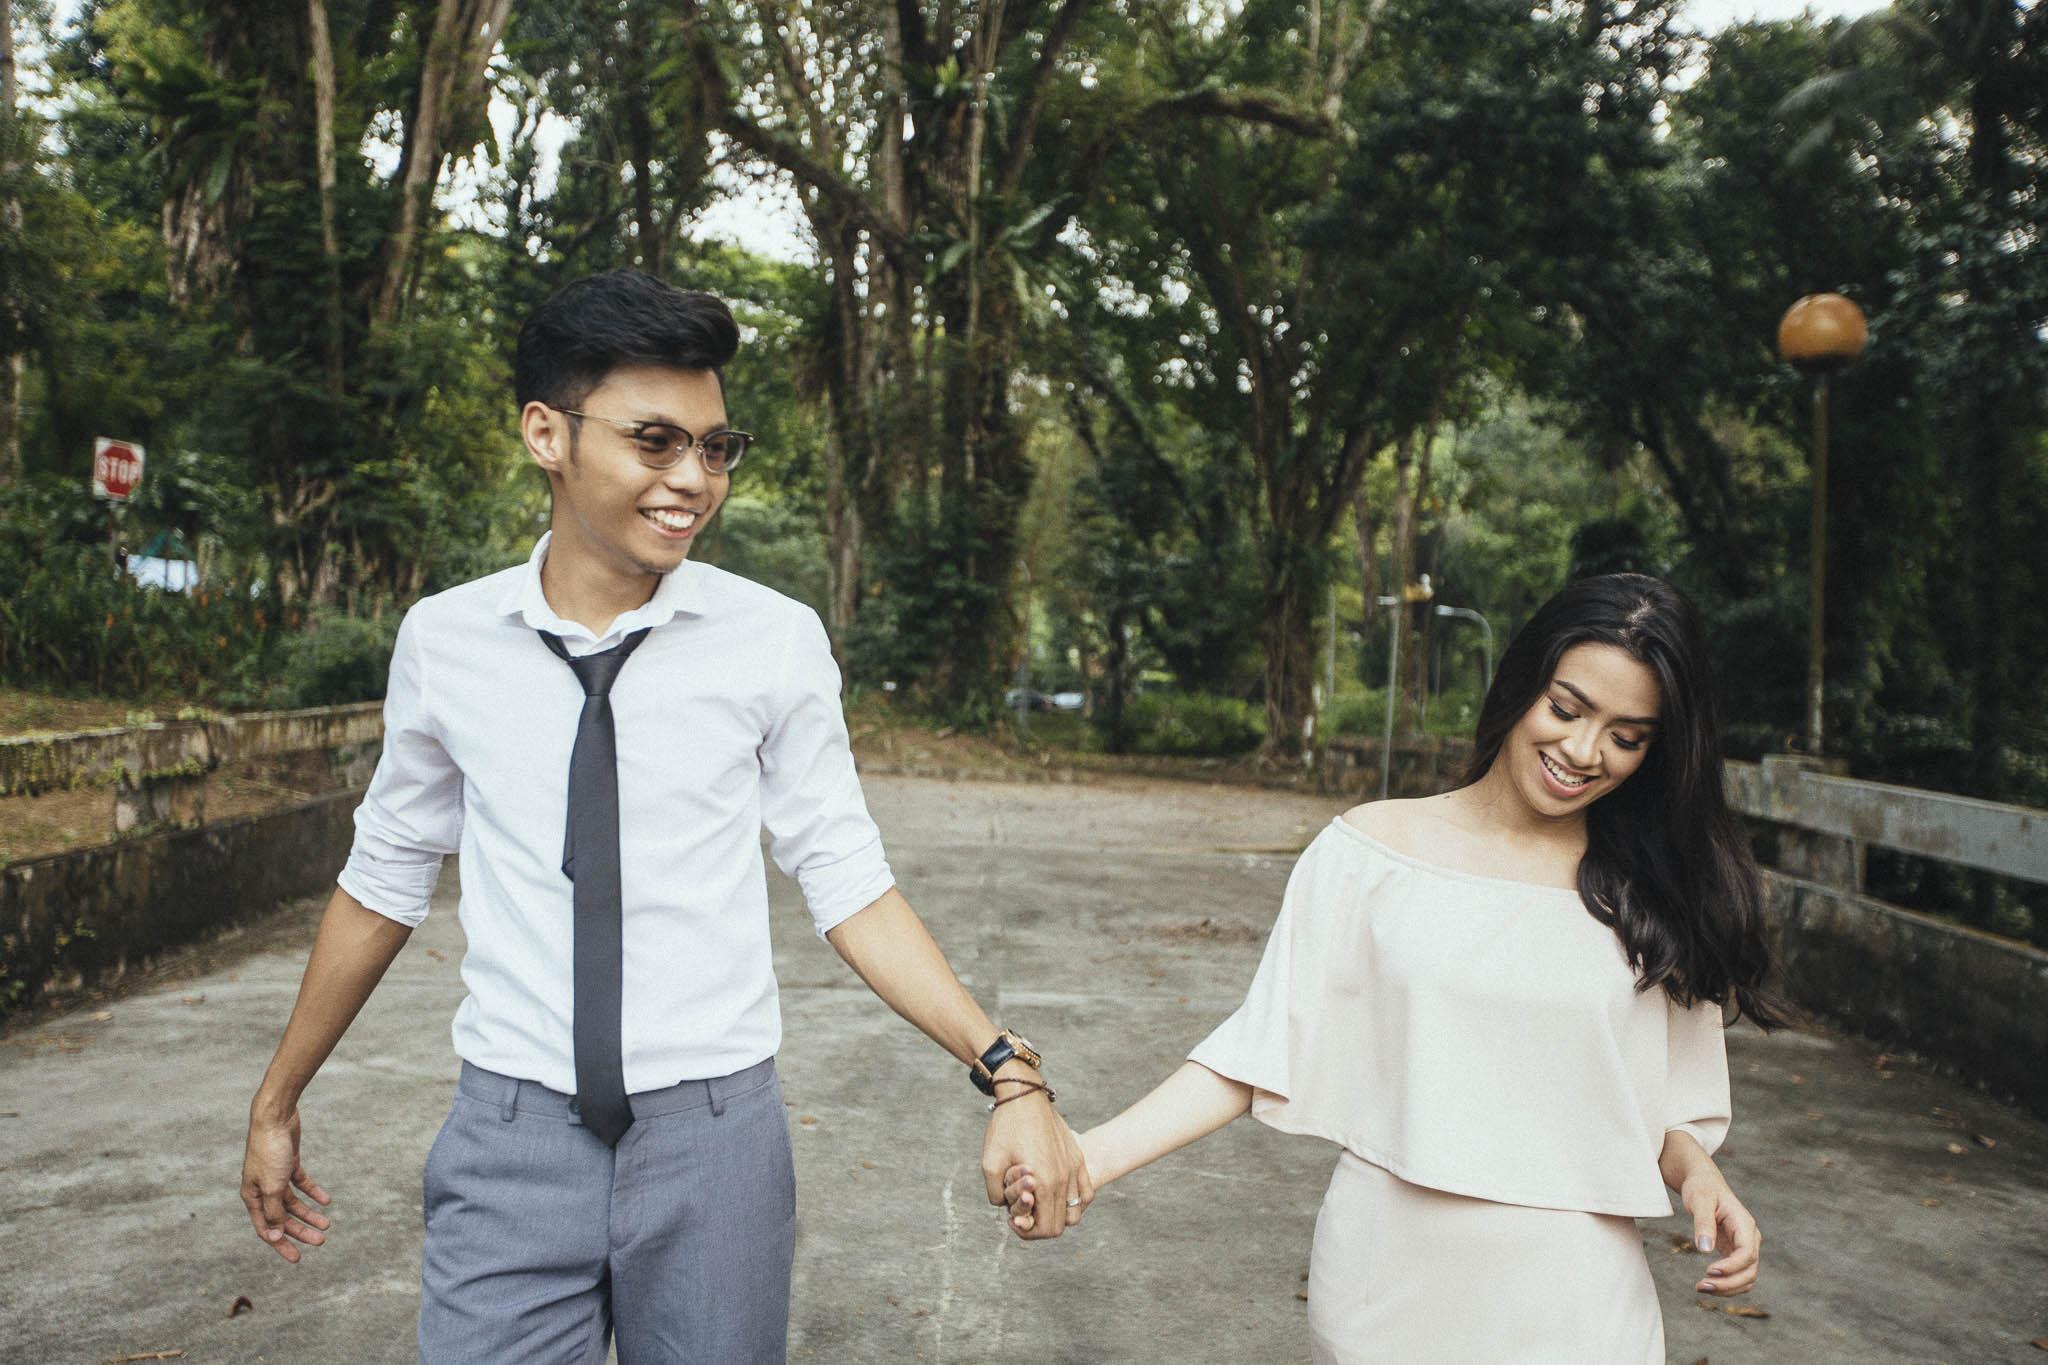 singapore-wedding-photographer-malay-travel-adli-tashah-12.jpg